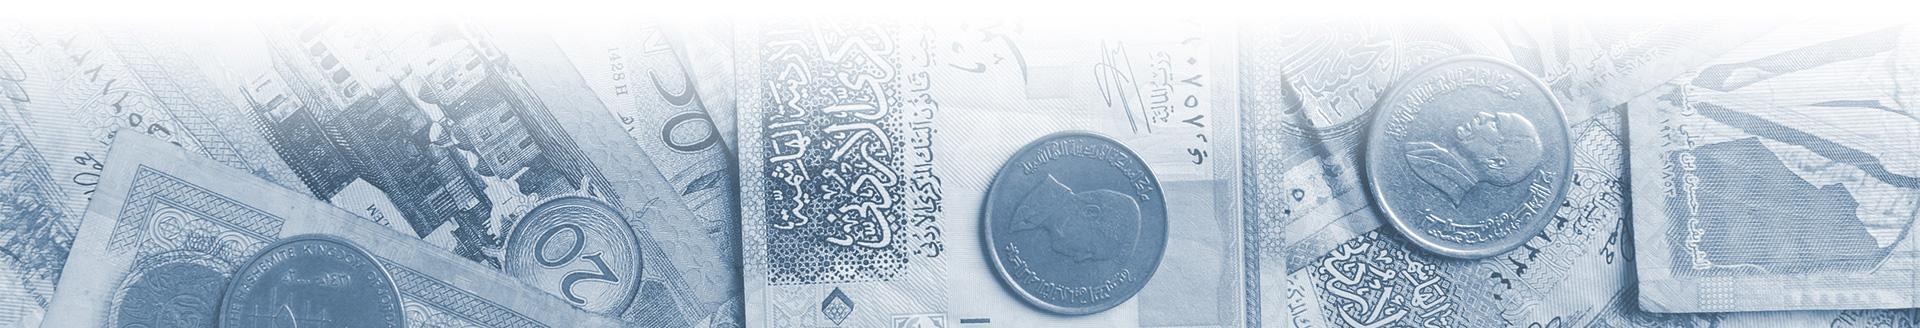 Linde v. Arab Bank, Plc - Payments to Hamas Controlled Organizations - Osen LLC